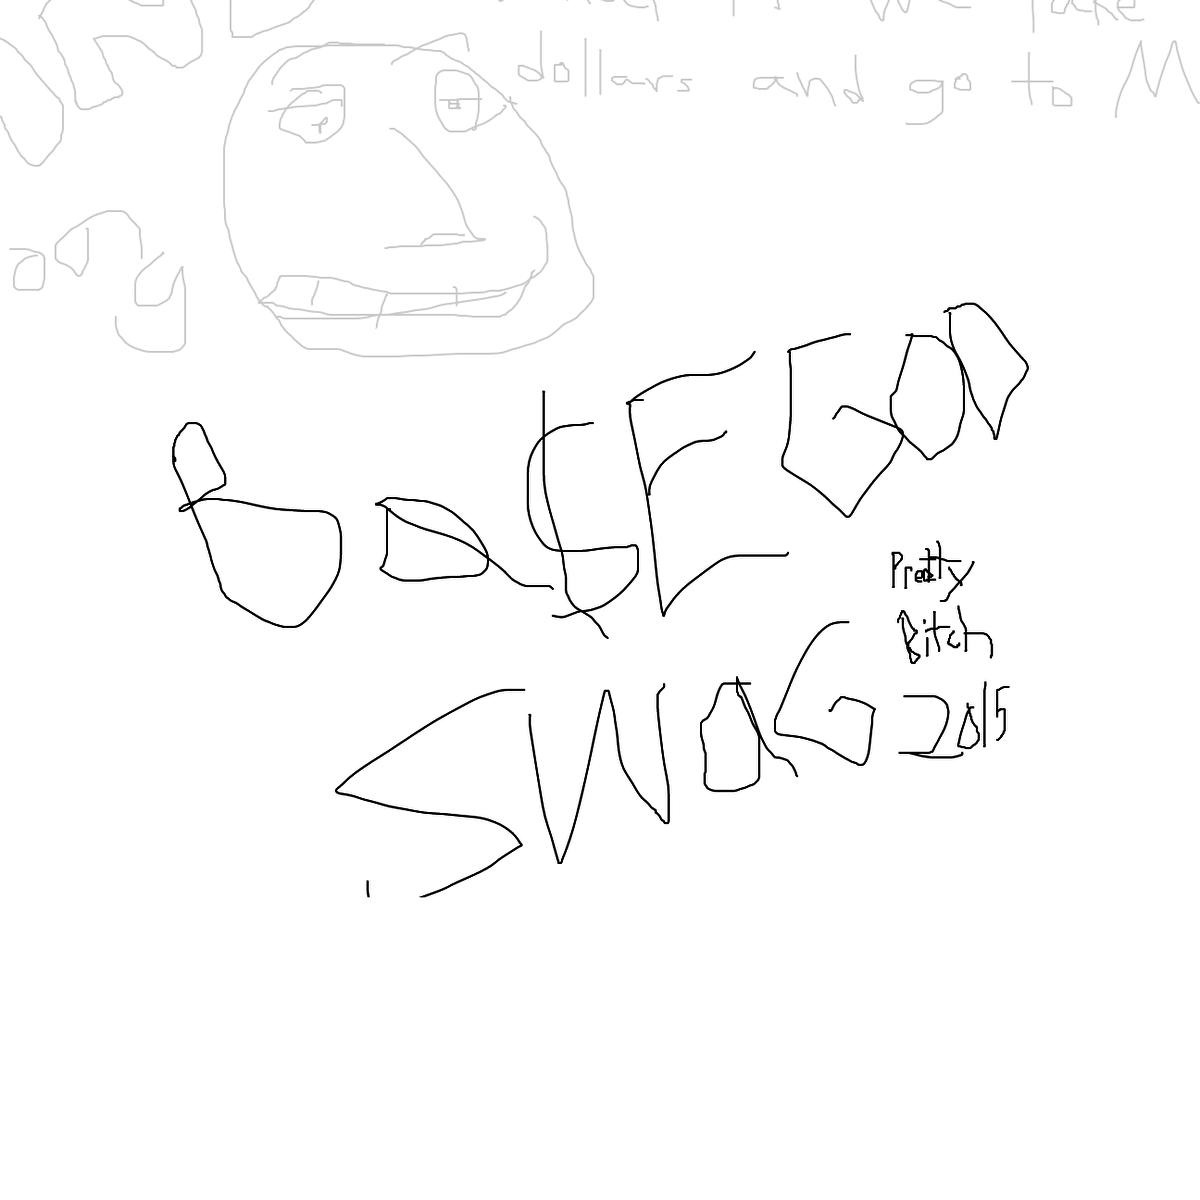 BAAAM drawing#7722 lat:-12.0501174926757810lng: -51.5039367675781250